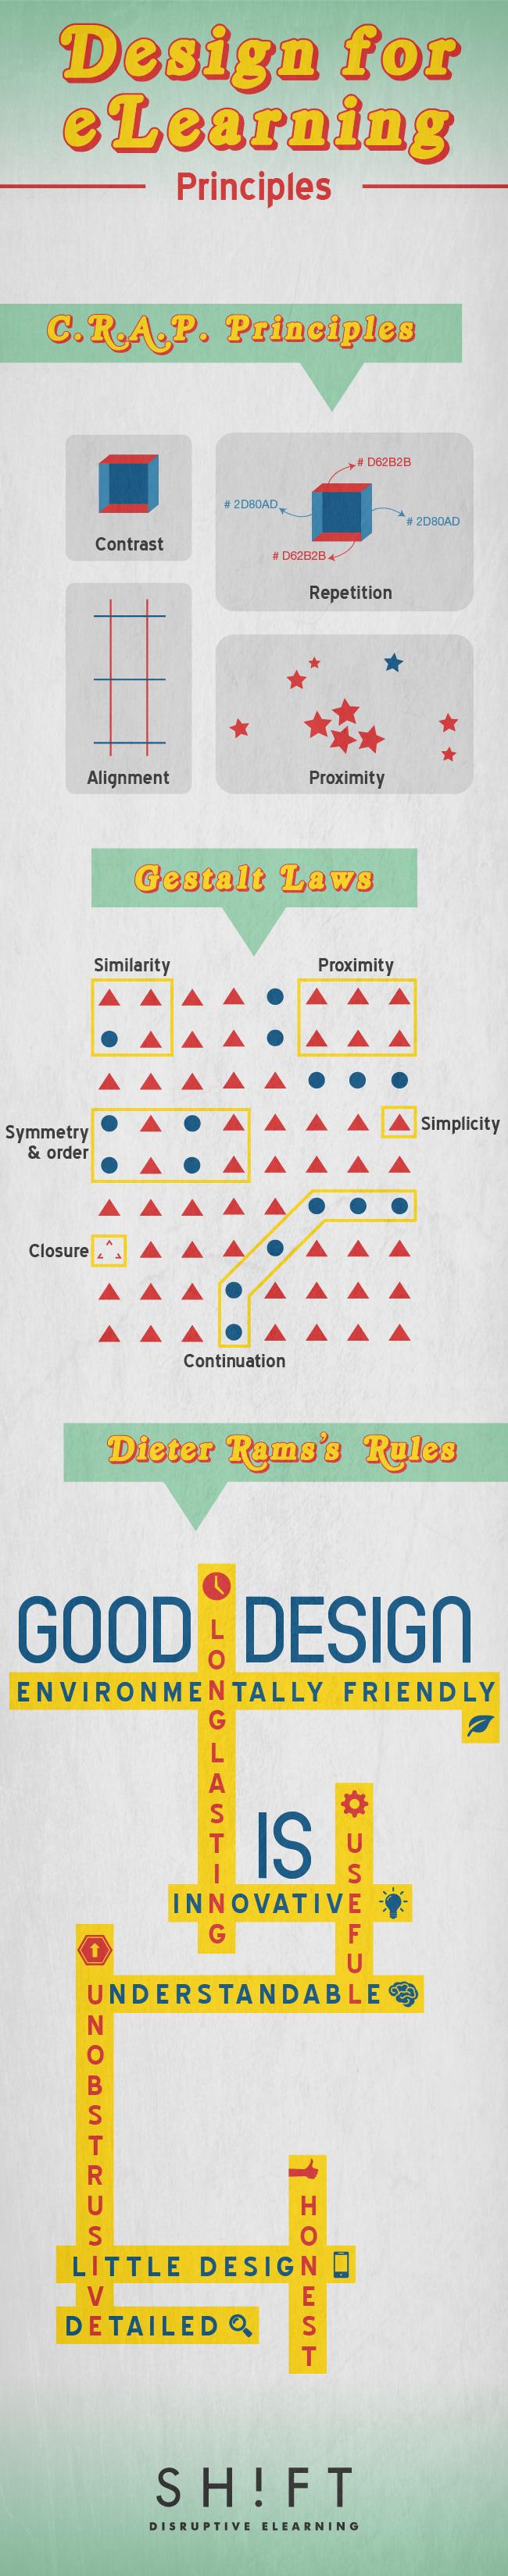 eLearning design principles